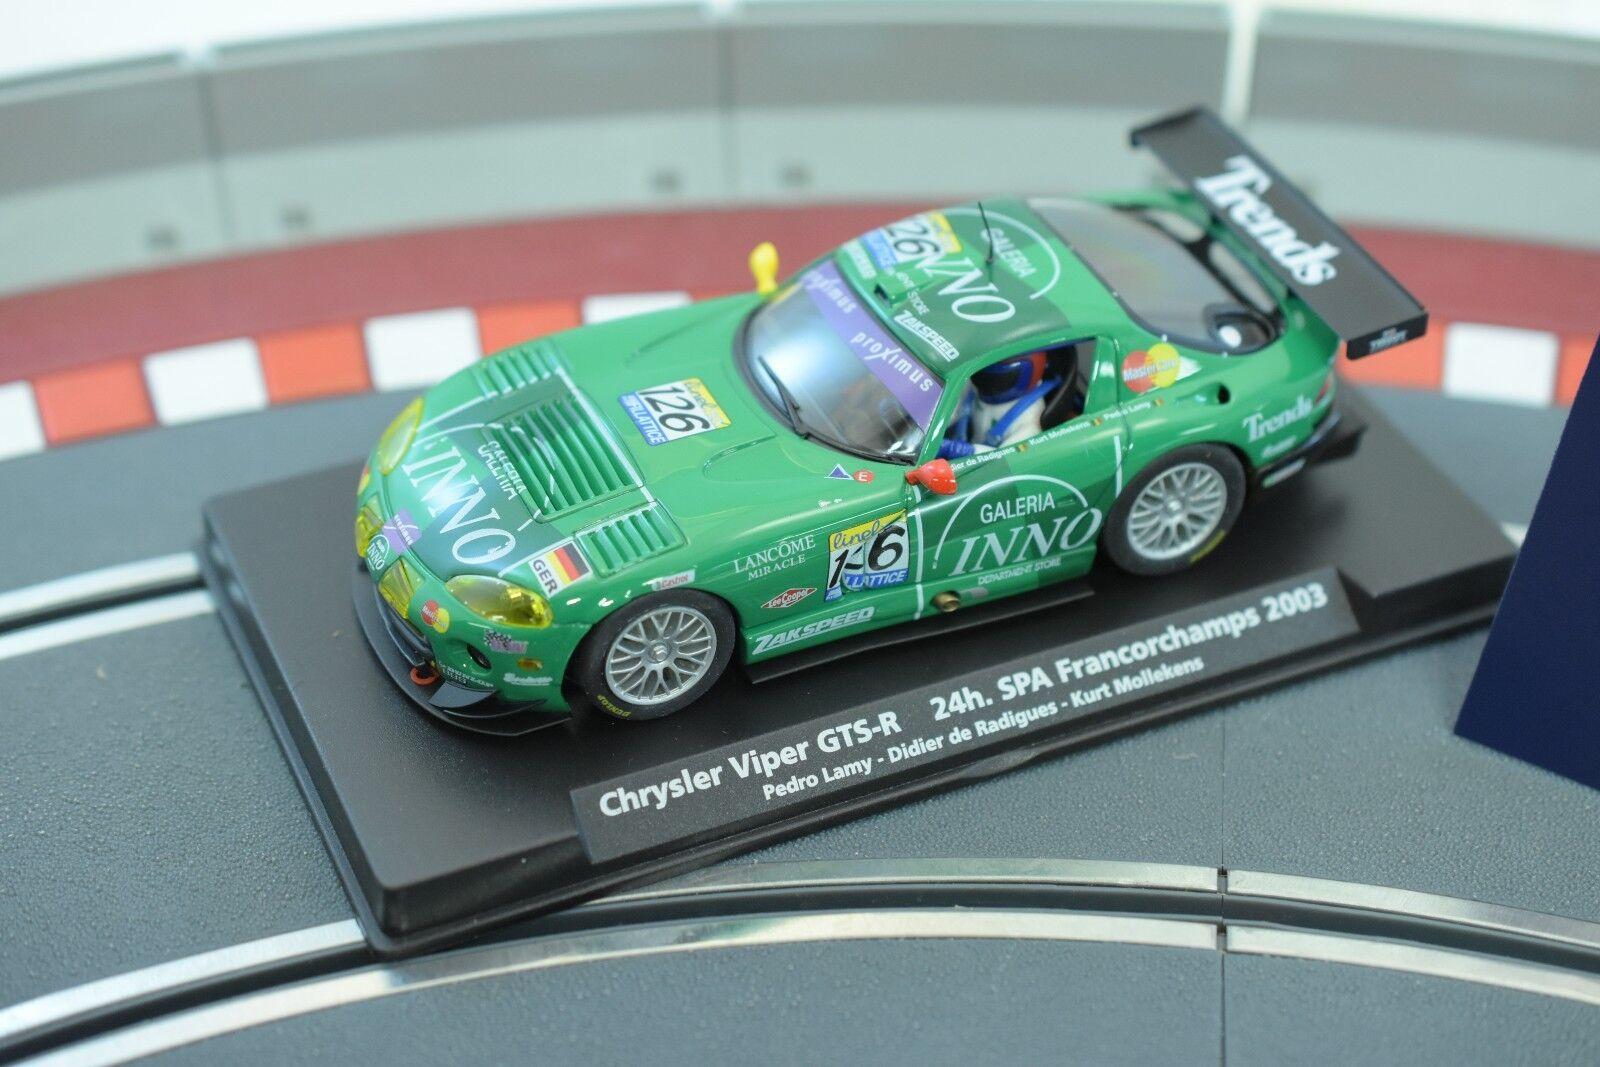 88154 FLY CAR MODELS 1 32 SLOT CARS CHRYSLER VIPER GTS-R 24H. SPA 2003 A-209